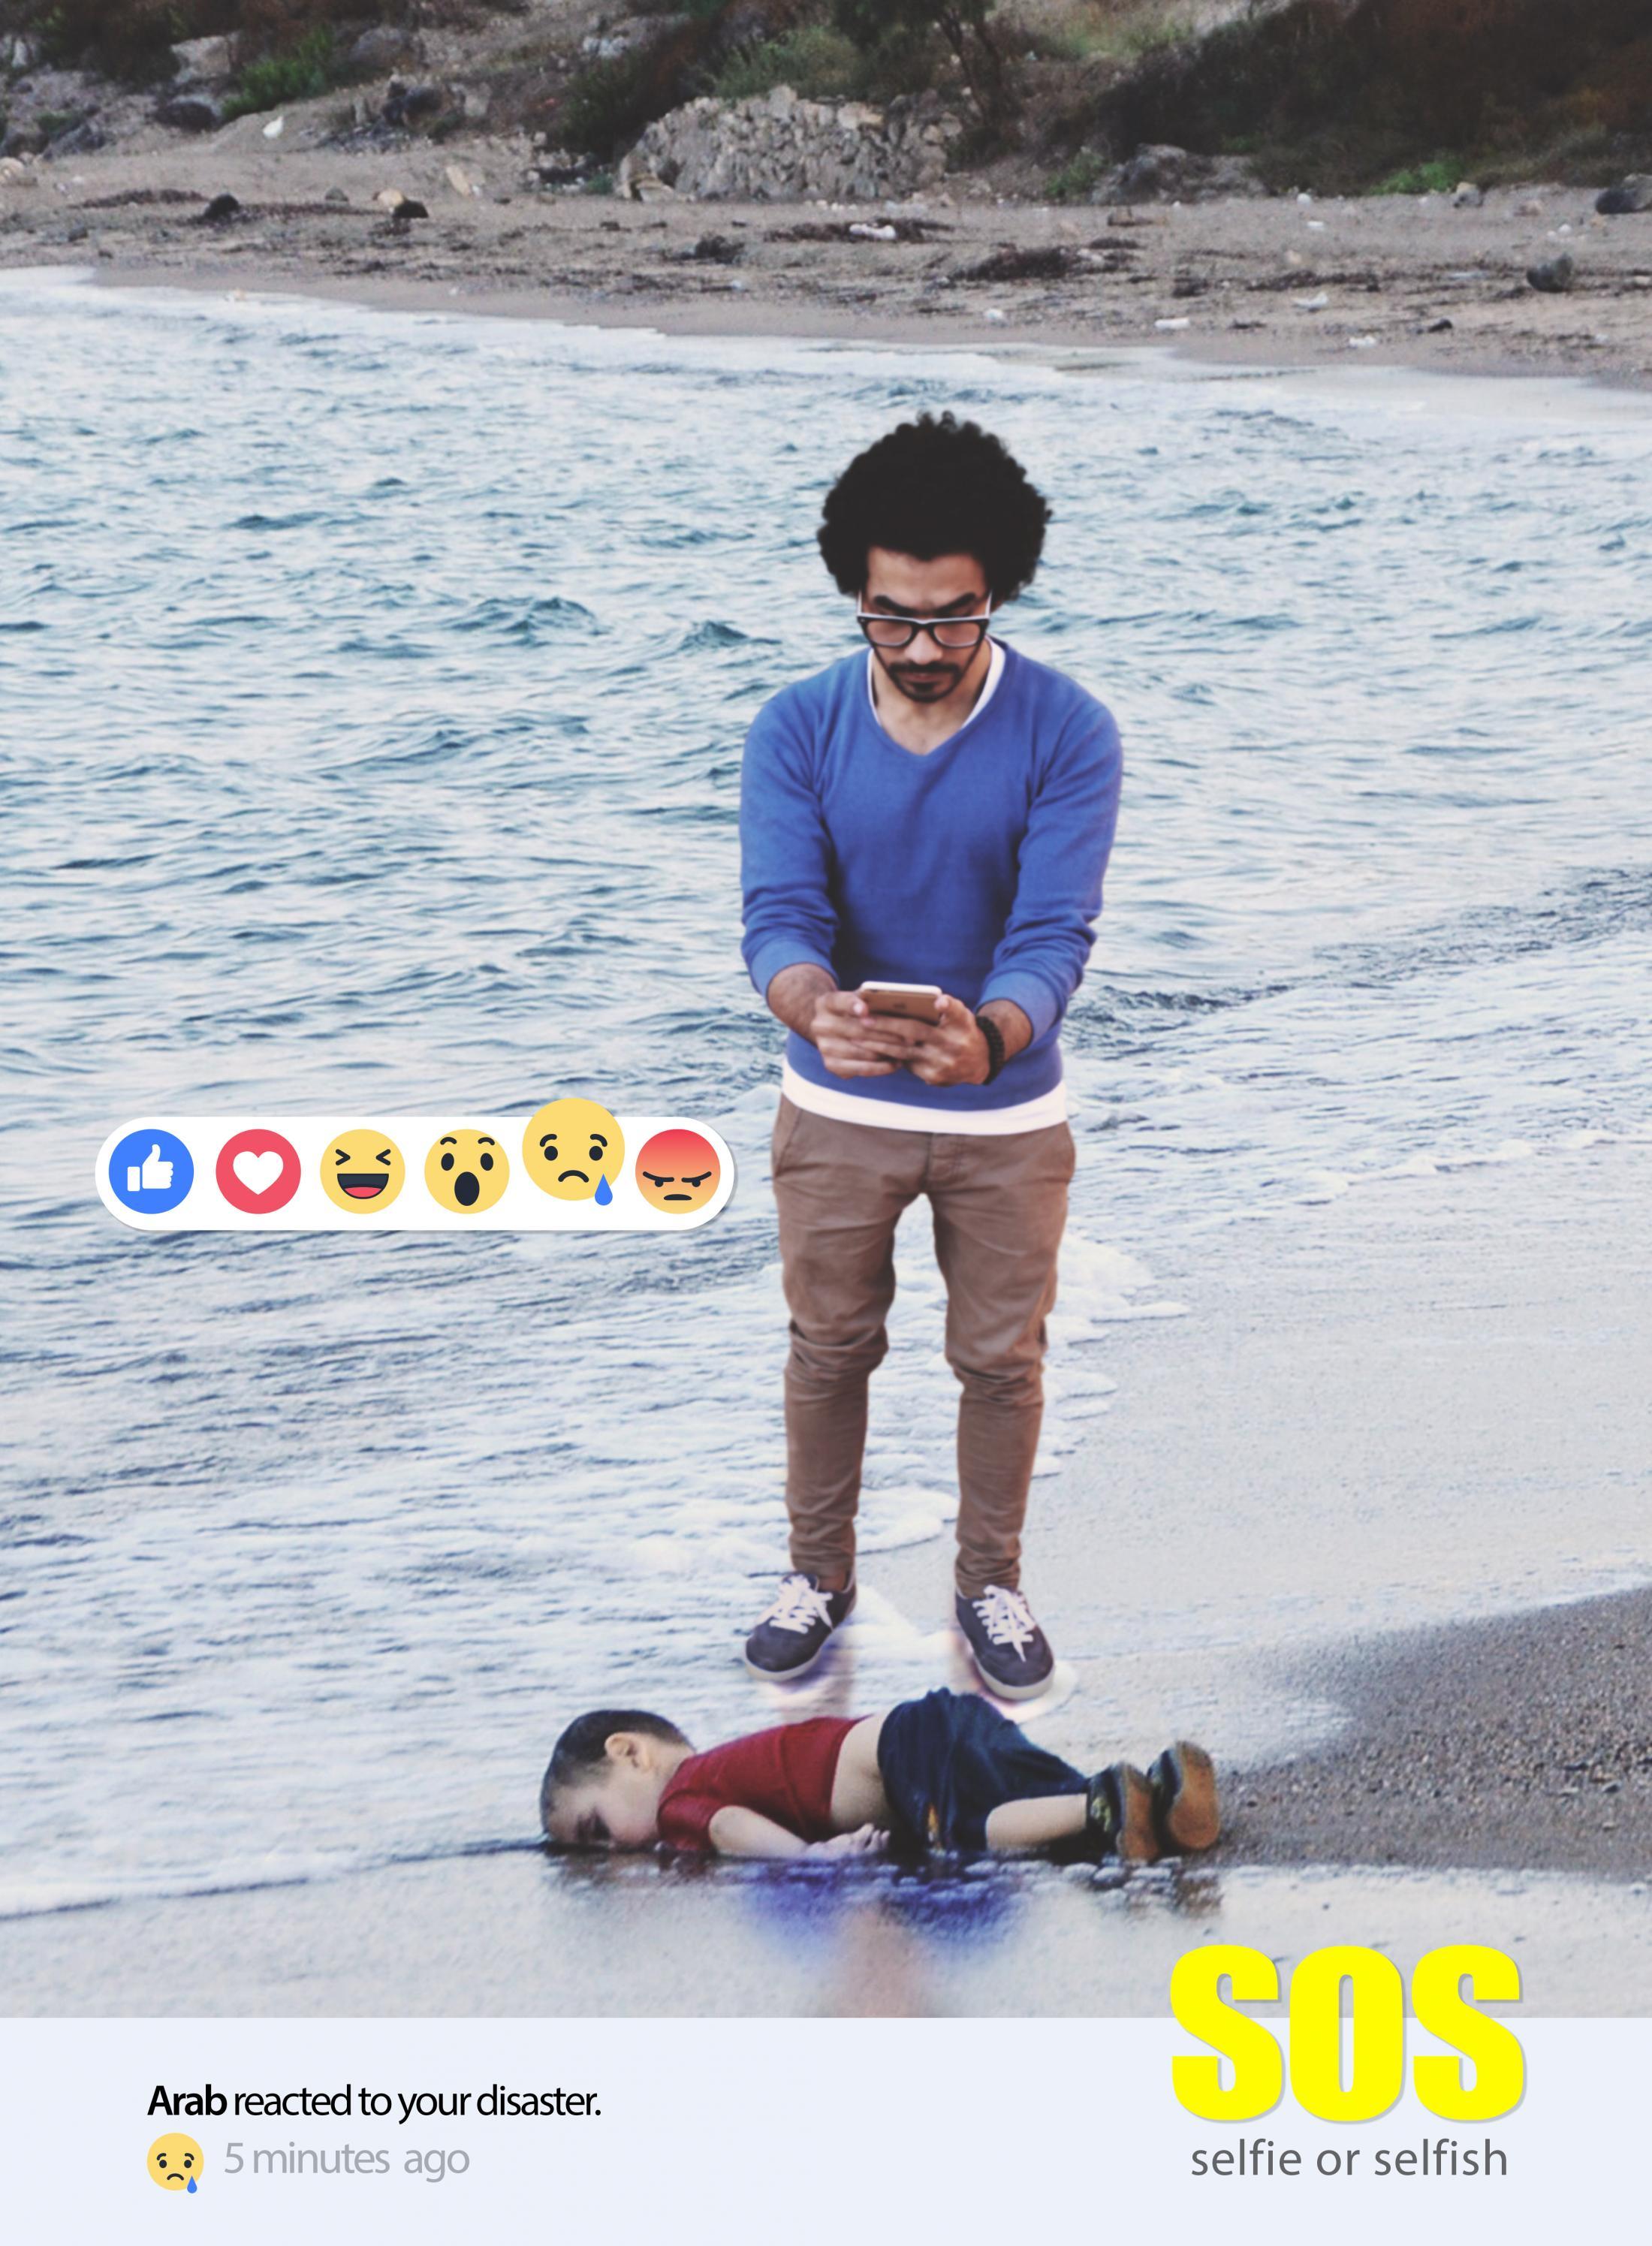 Arab Reaction to their Brothers in Syria Digital Ad - Selfie or Selfish, 3